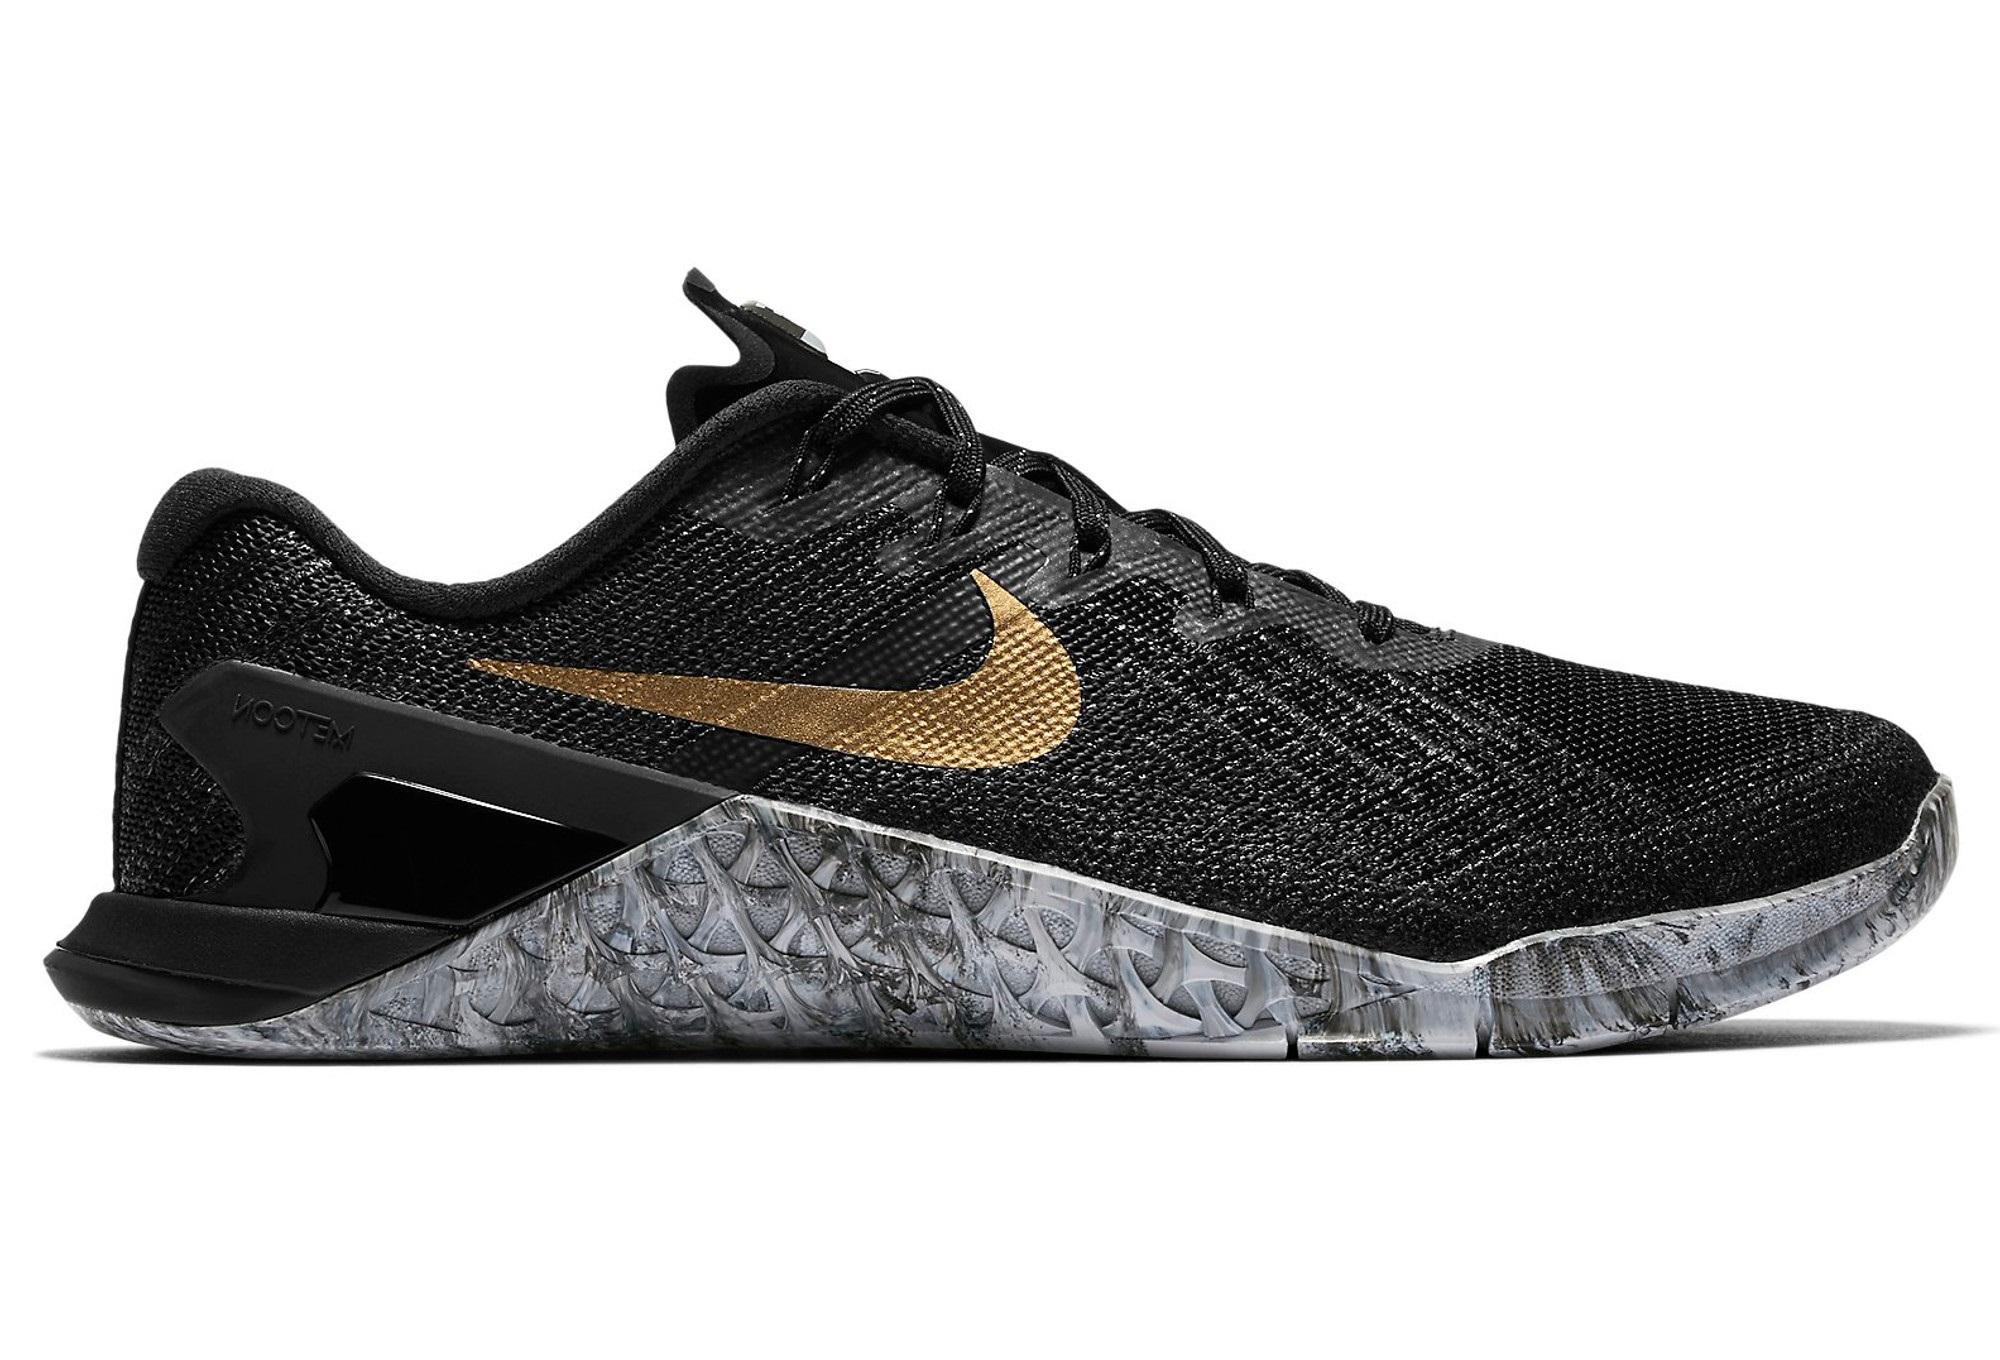 new style 8f2f7 1a851 Chaussures de Cross Training Femme Nike Metcon 3 AMP Noir  Gris